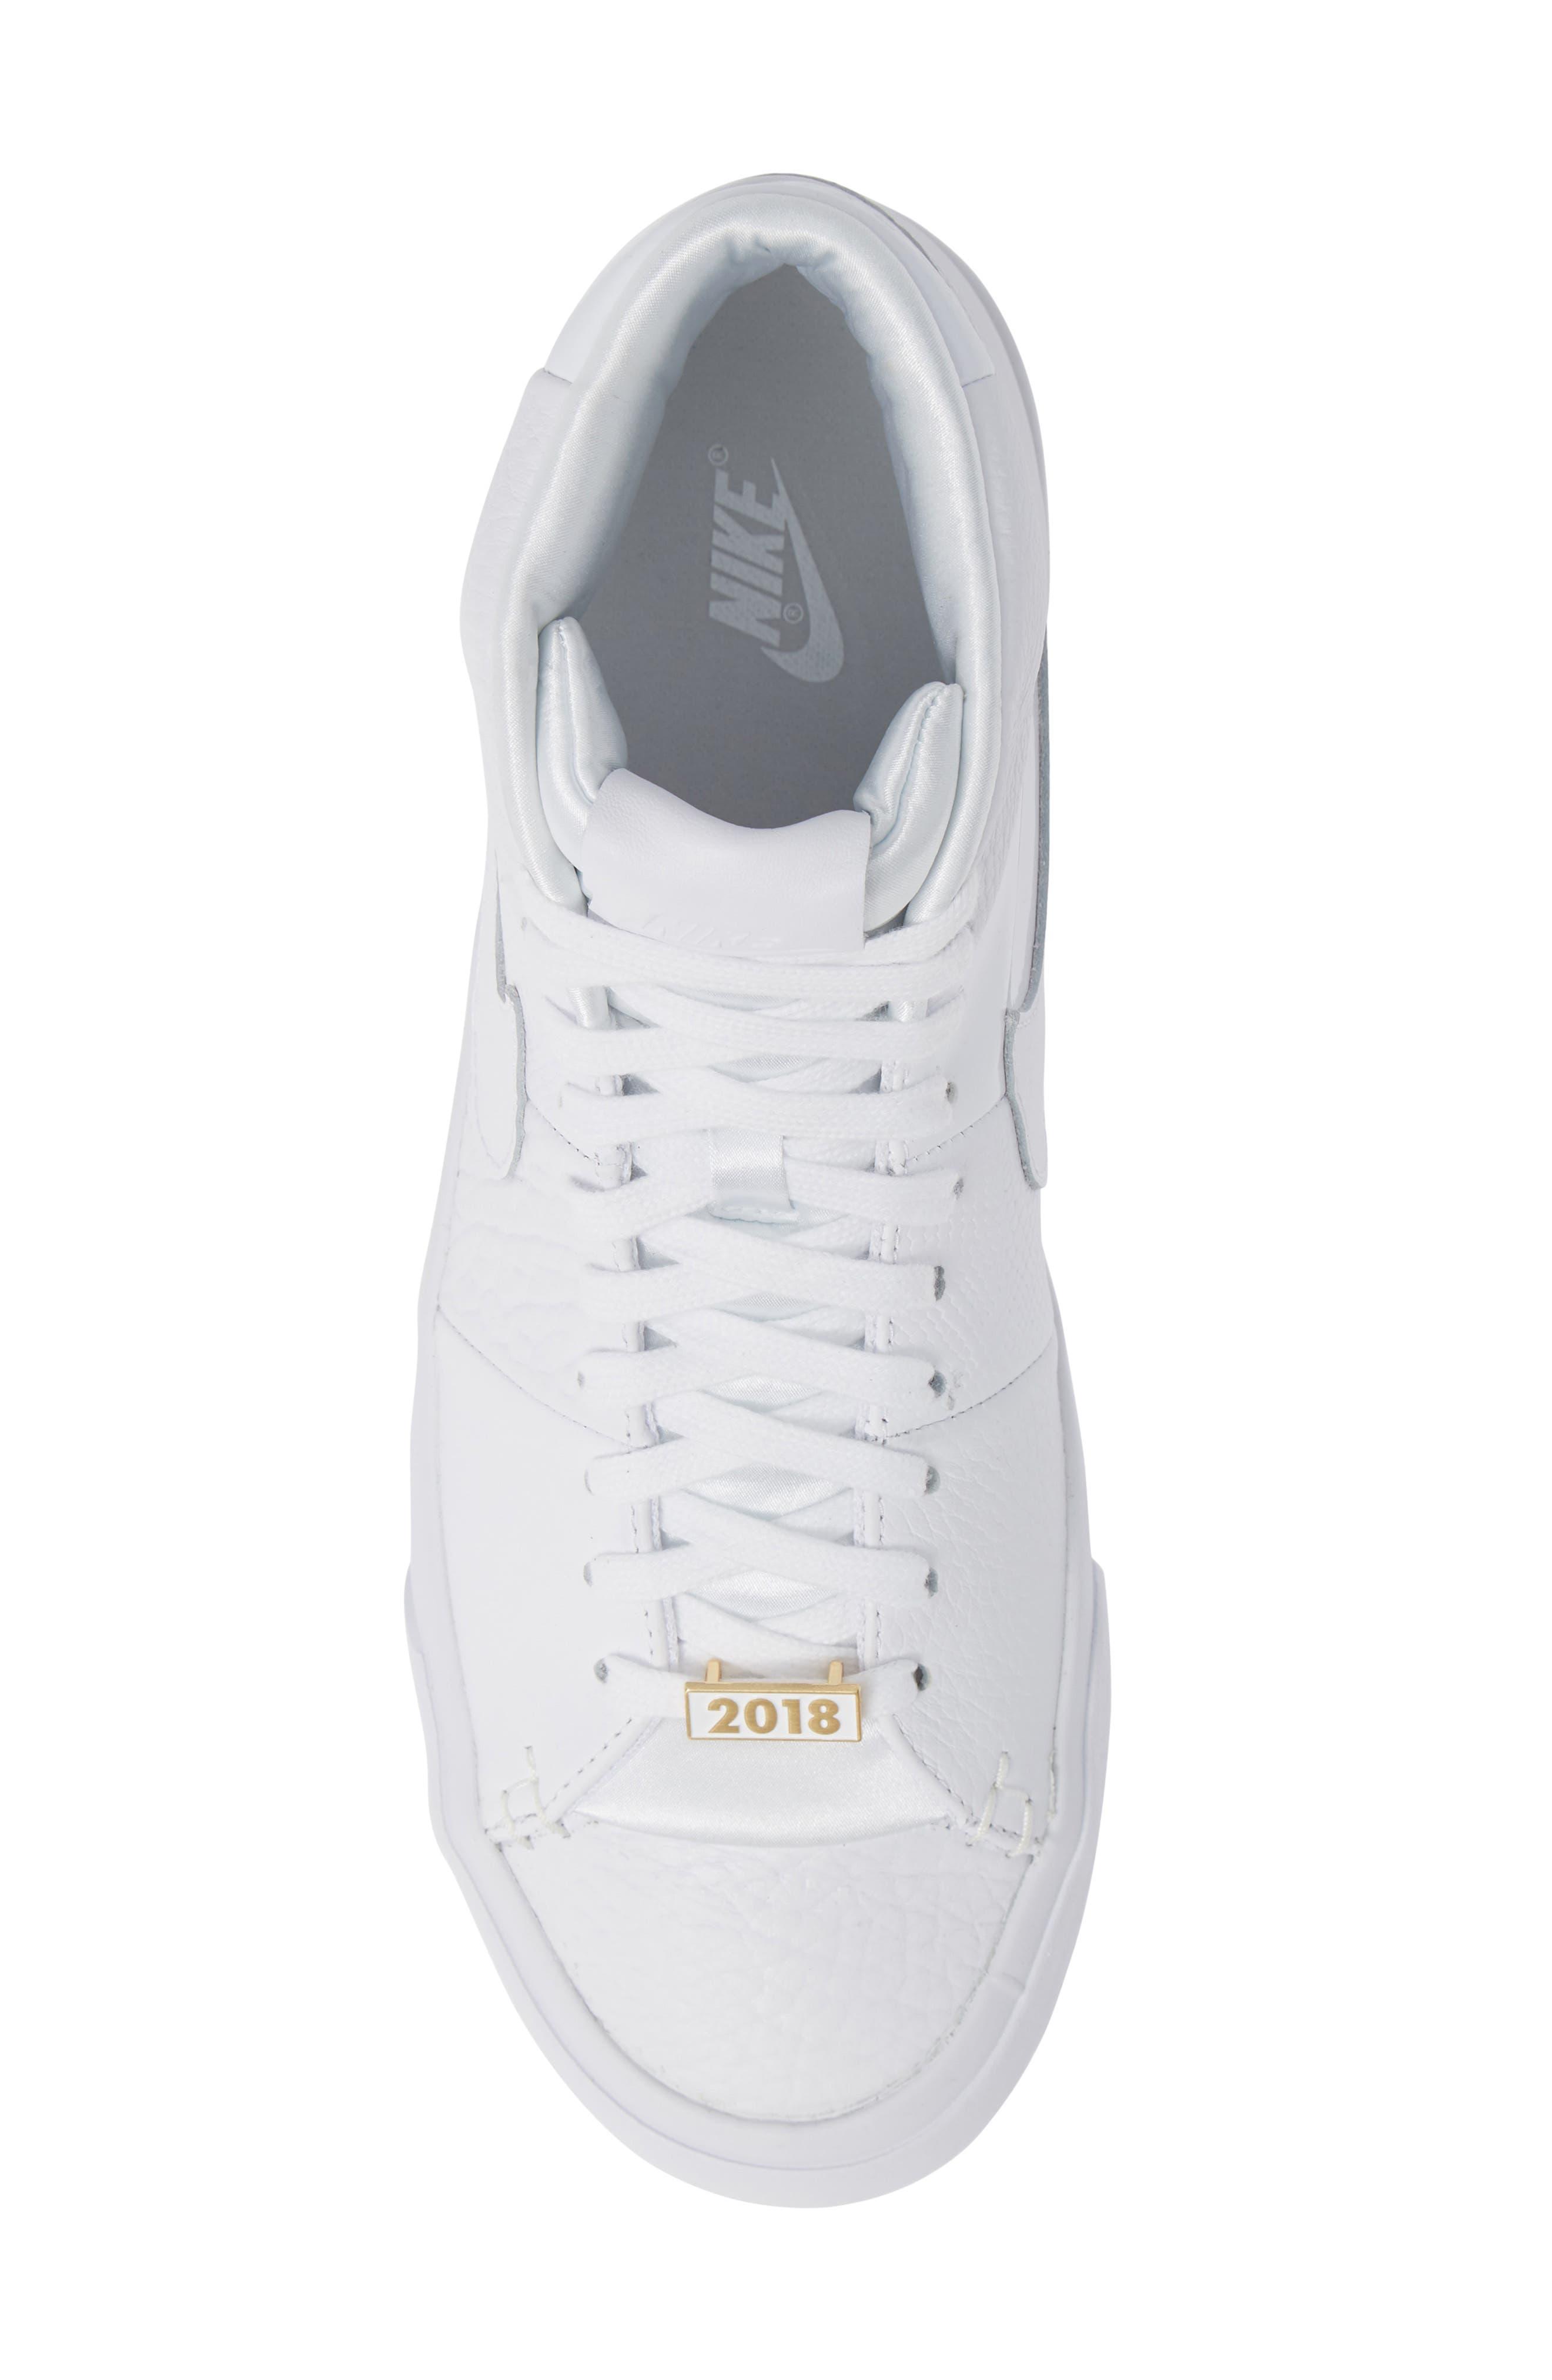 Blazer Royal QS High Top Sneaker,                             Alternate thumbnail 5, color,                             WHITE/ WHITE/ WHITE